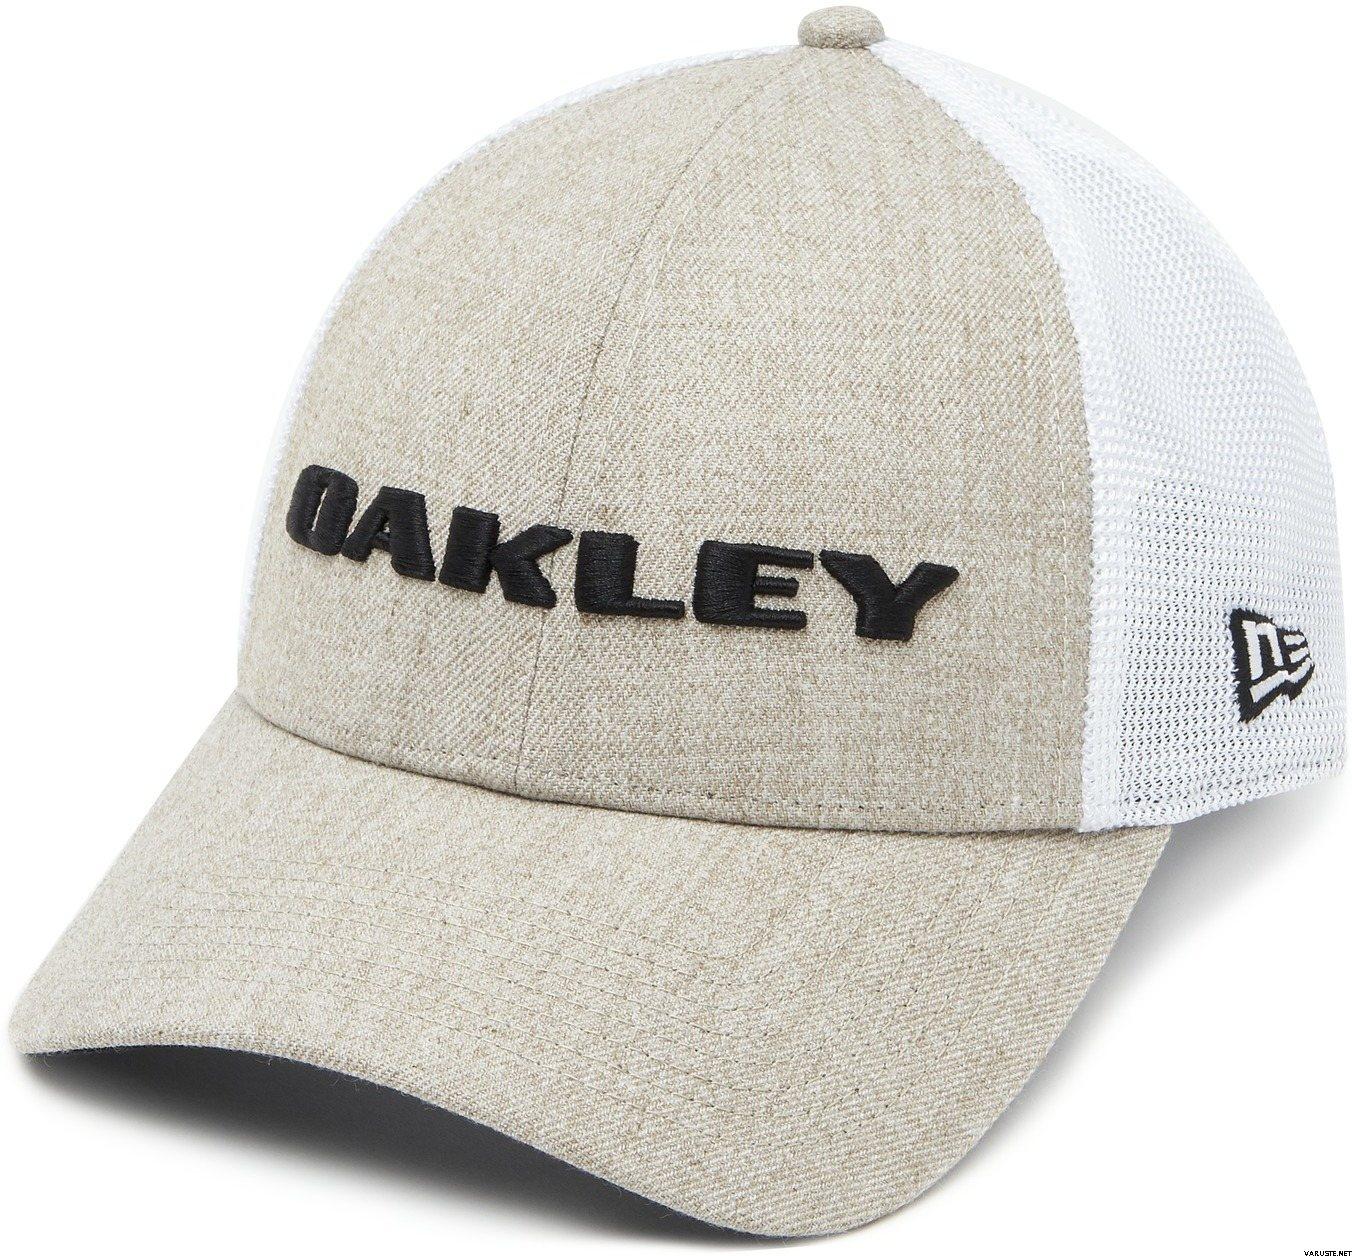 a0309dab5e6 Oakley Heather New Era Snapback Hat Rye